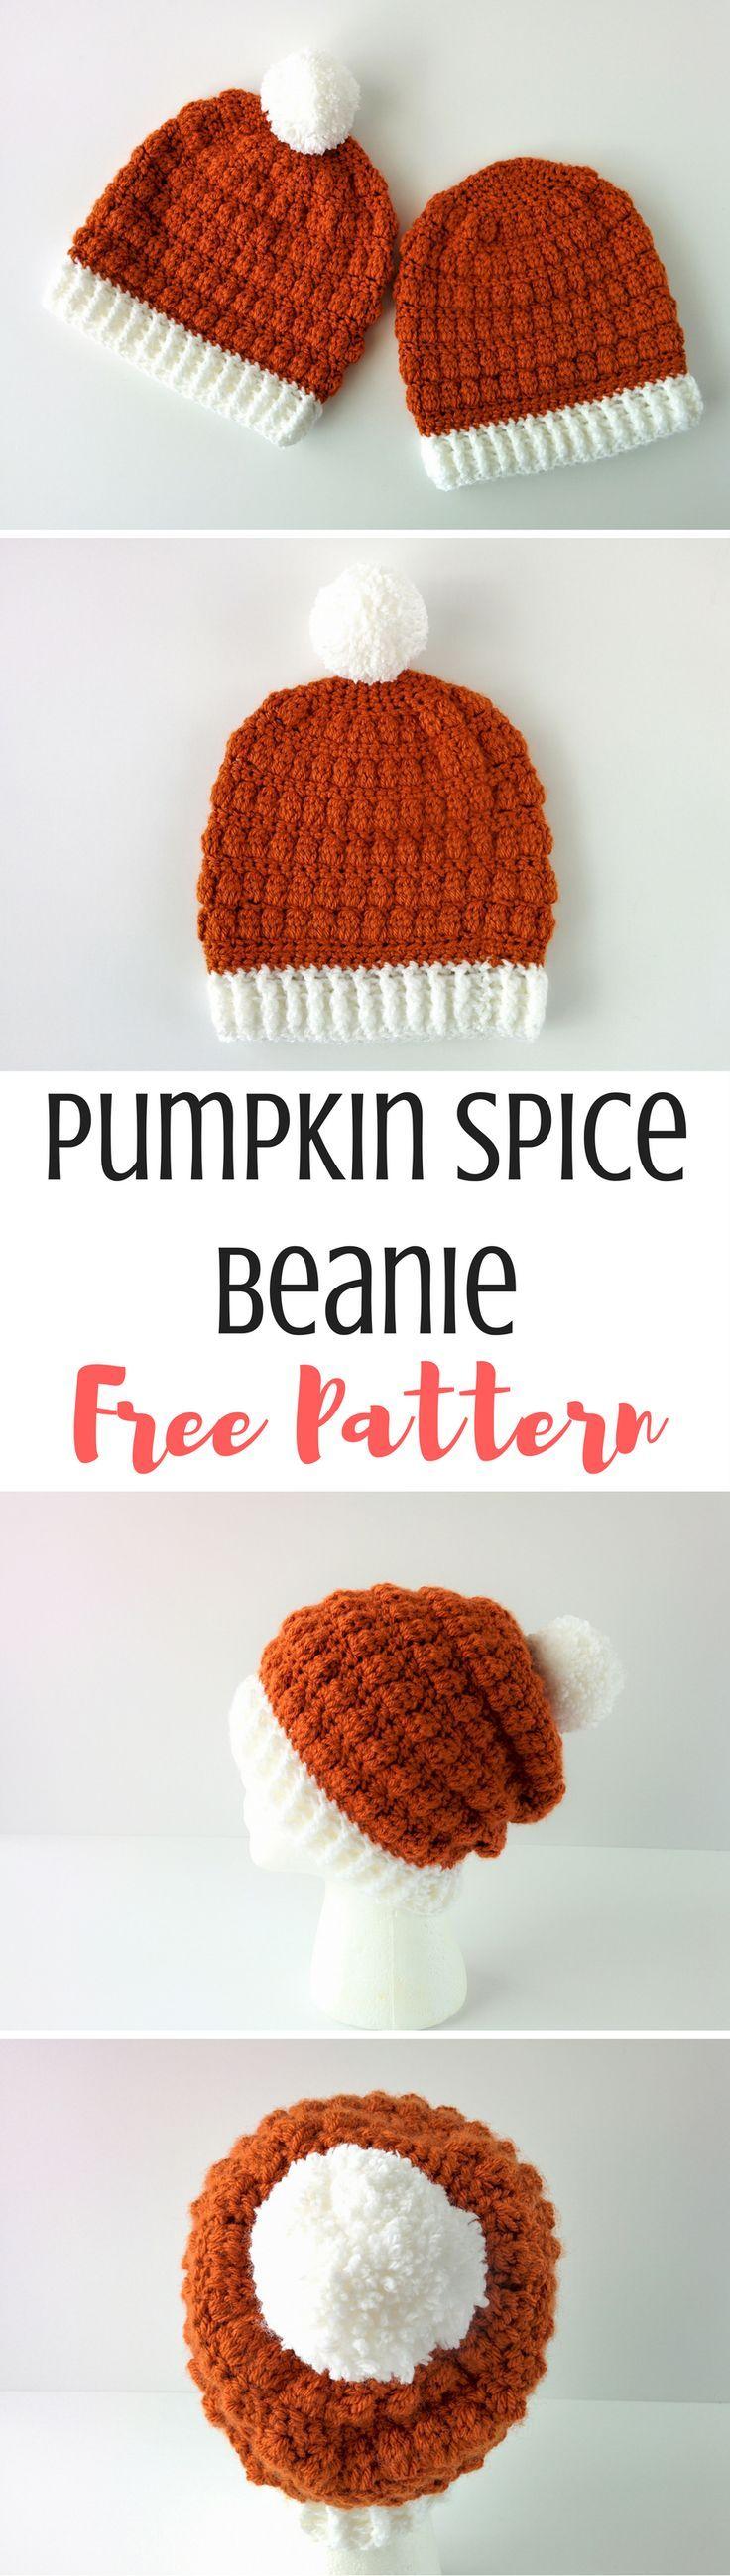 Pumpkin Spice Beanie: Easy Double Crochet Beanie Pattern | Crafts ...